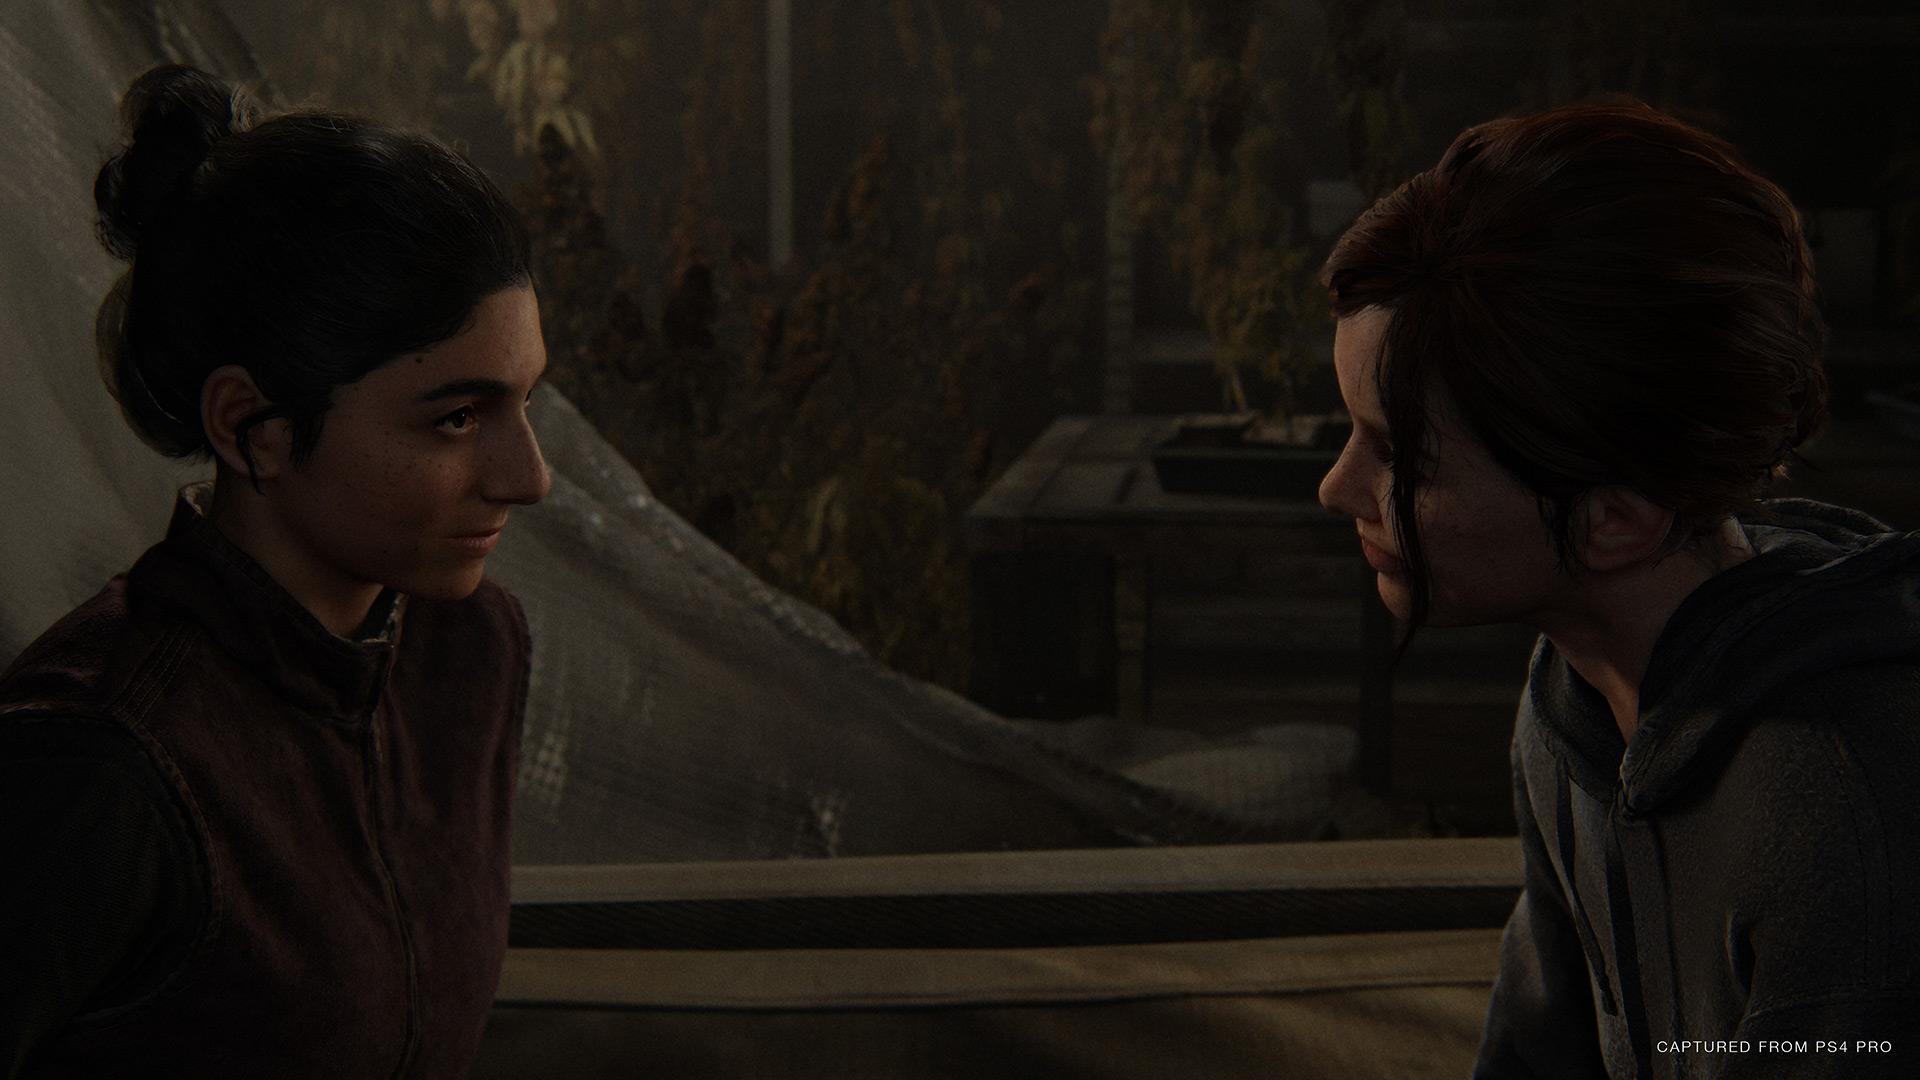 Quelle: SIE - The Last of Us Part II - Emotionale Bindung?